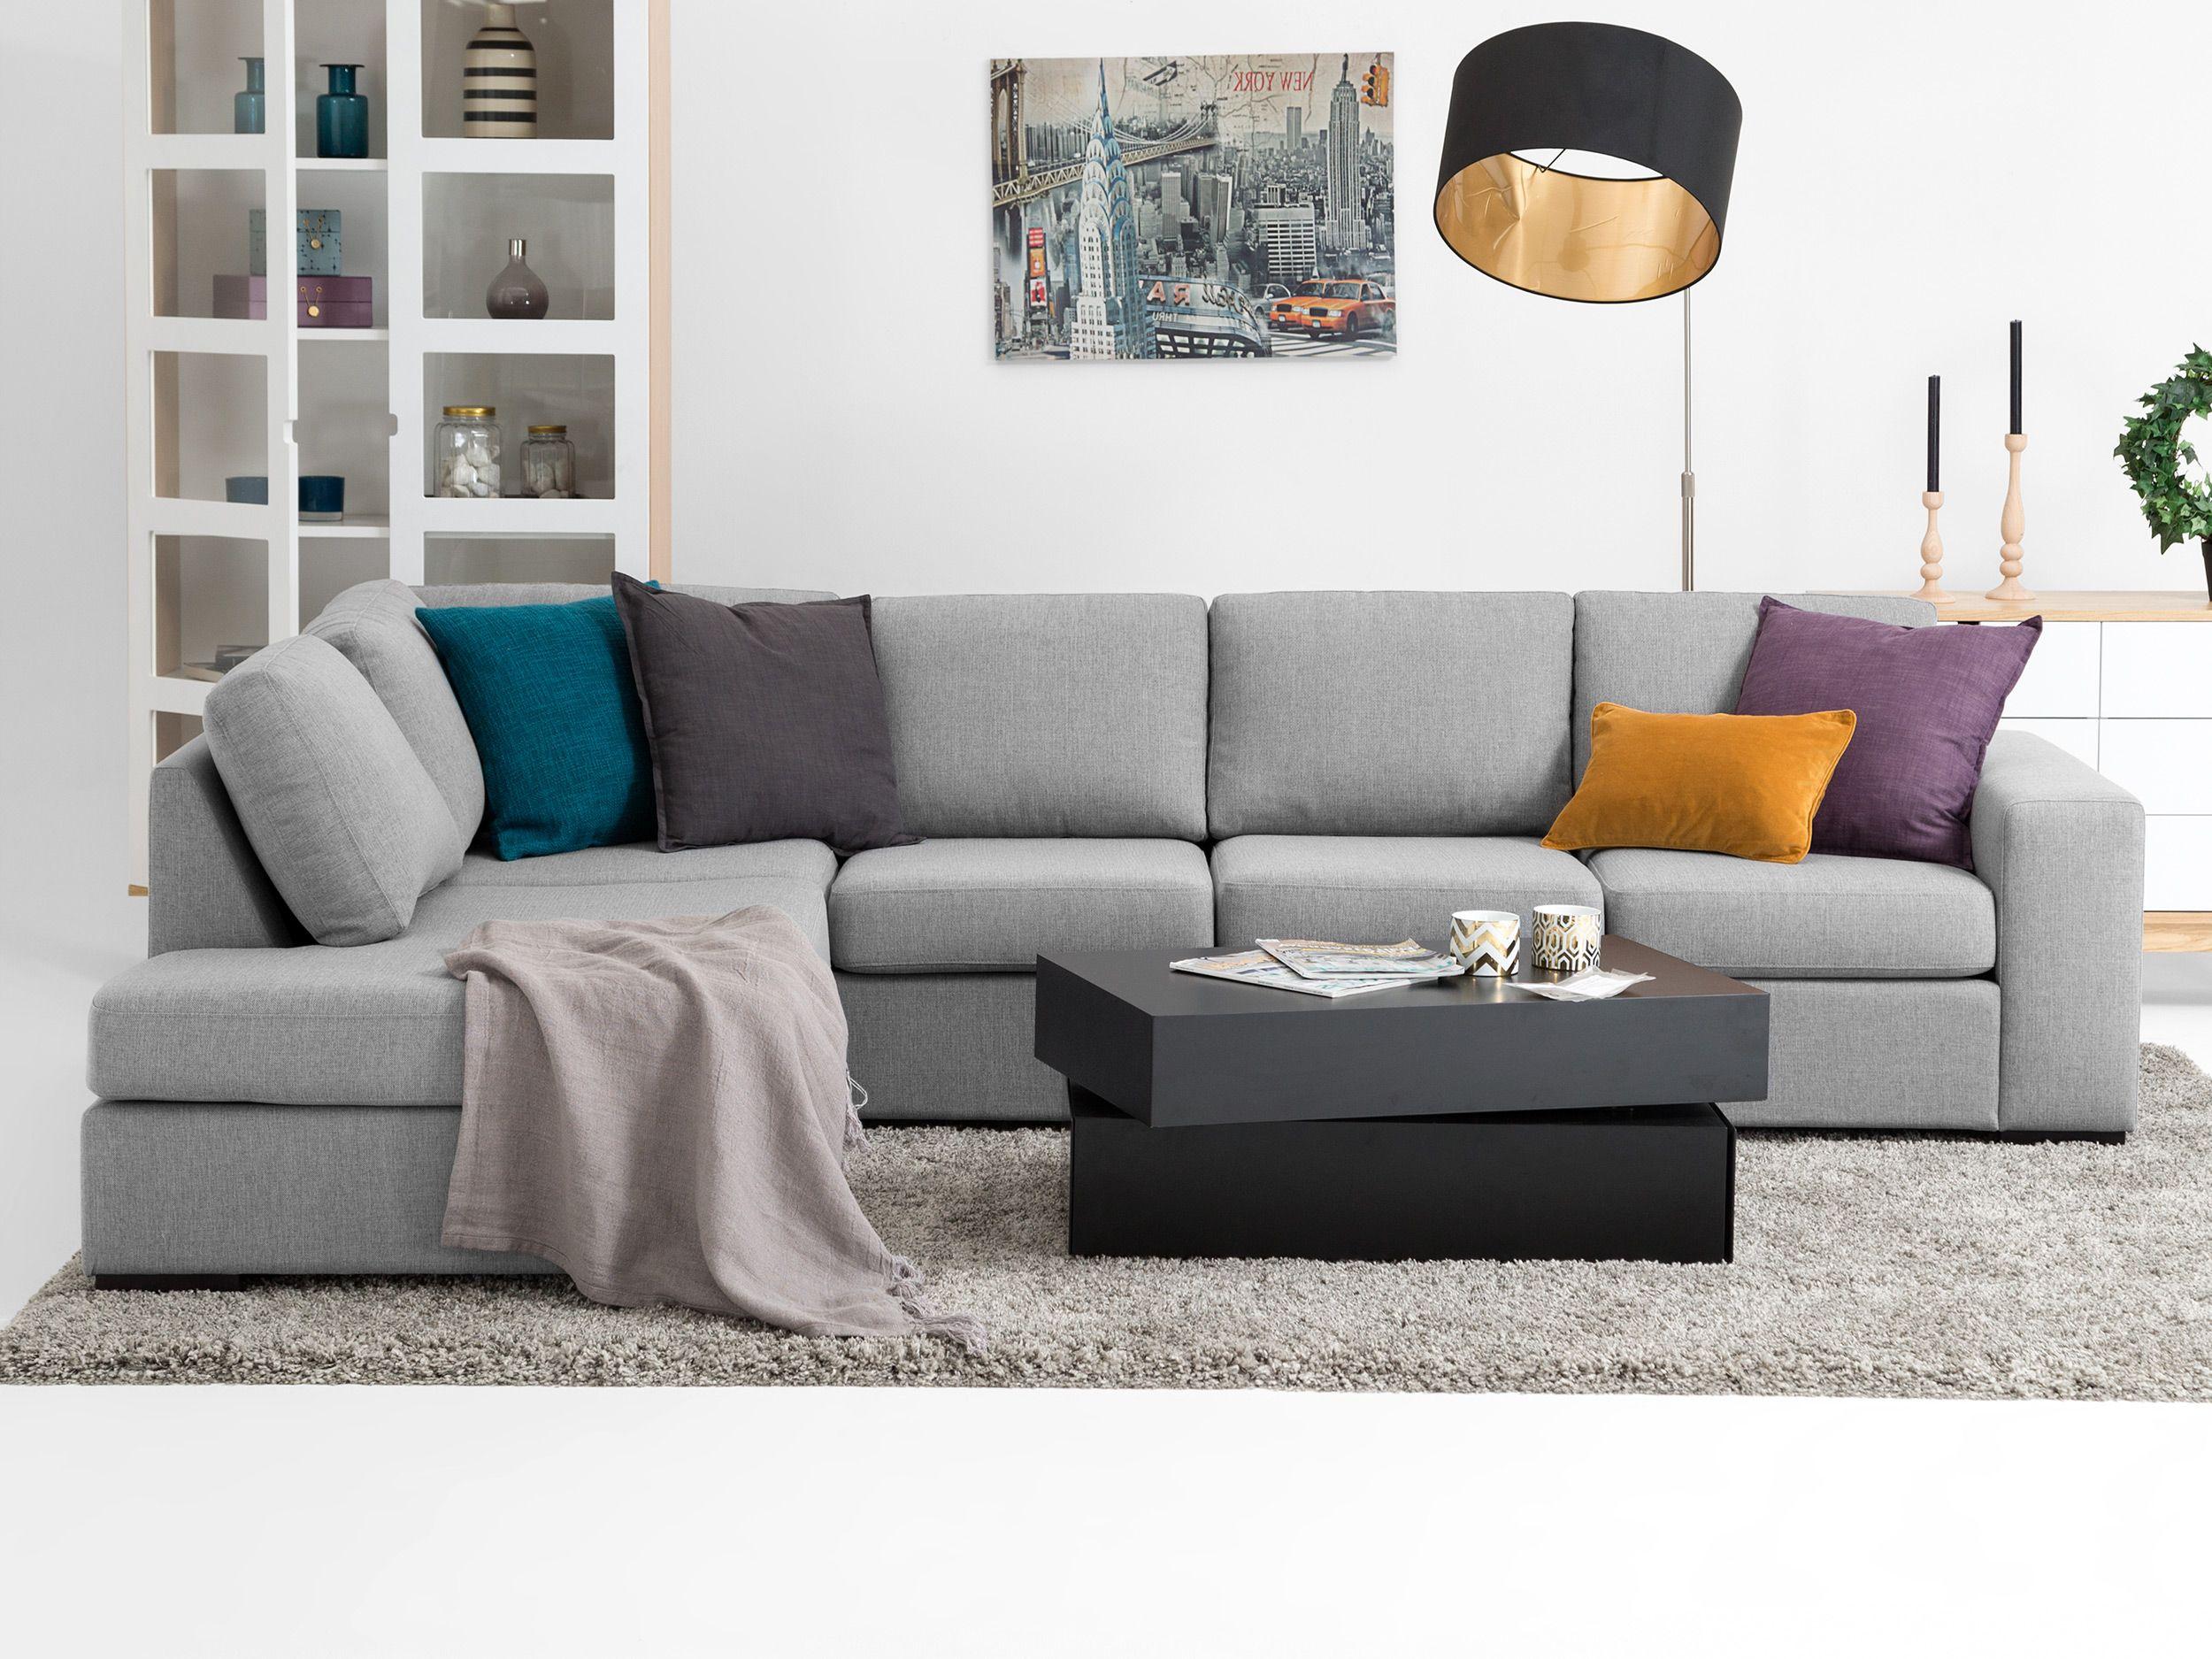 Ecksofas Design york large l sofa hellgrau ecksofas sofas für den inn